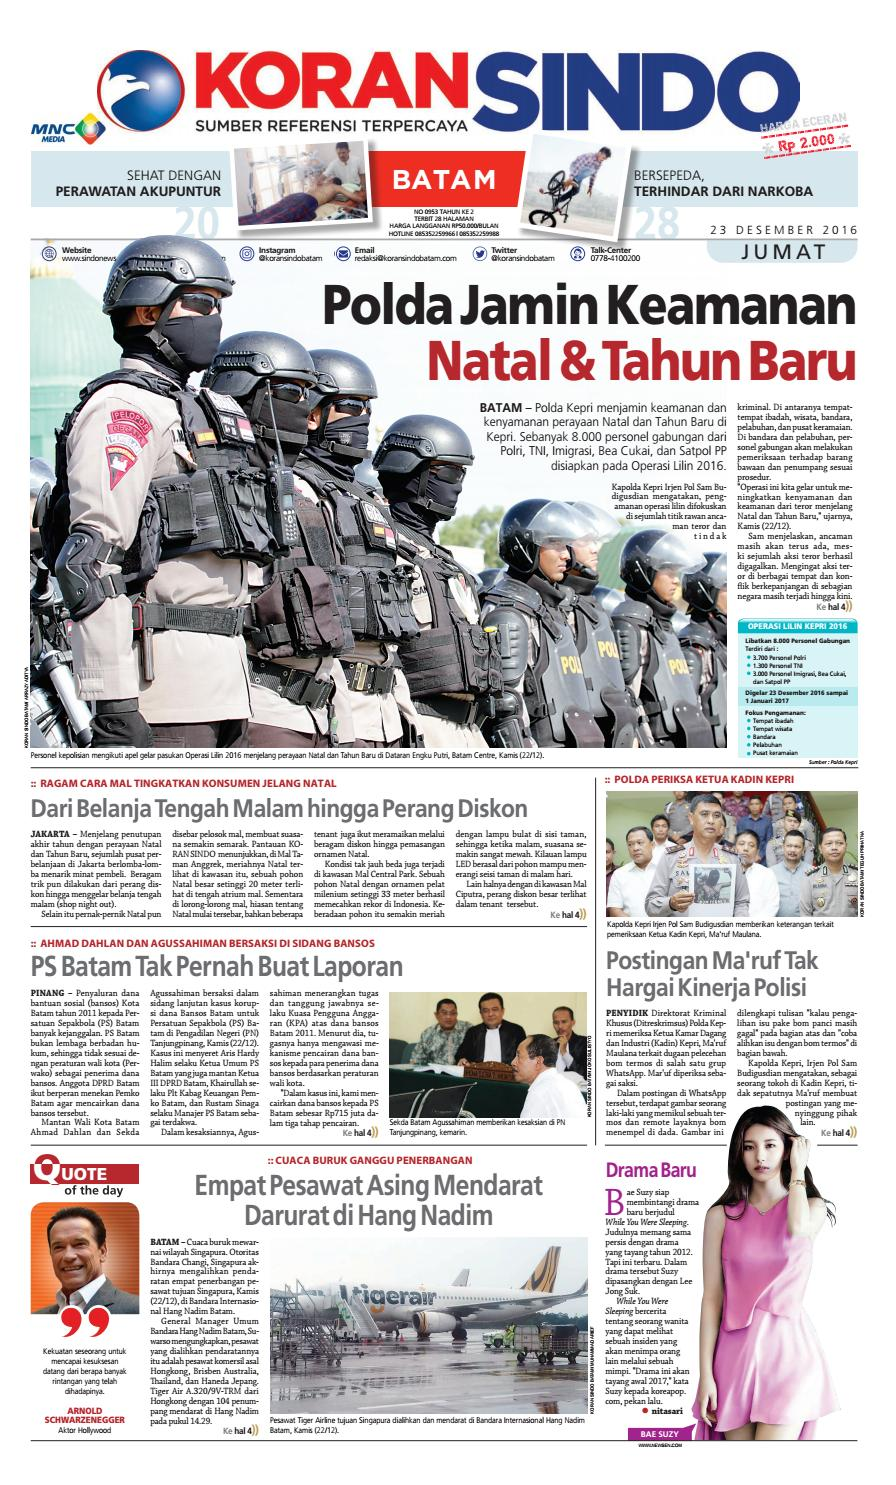 Koran Sindo Batam Edisi Jumat 23 Desember 2016 By Produk Ukm Bumn Earring Mas Putih Mutiara Laut Newspaper Issuu